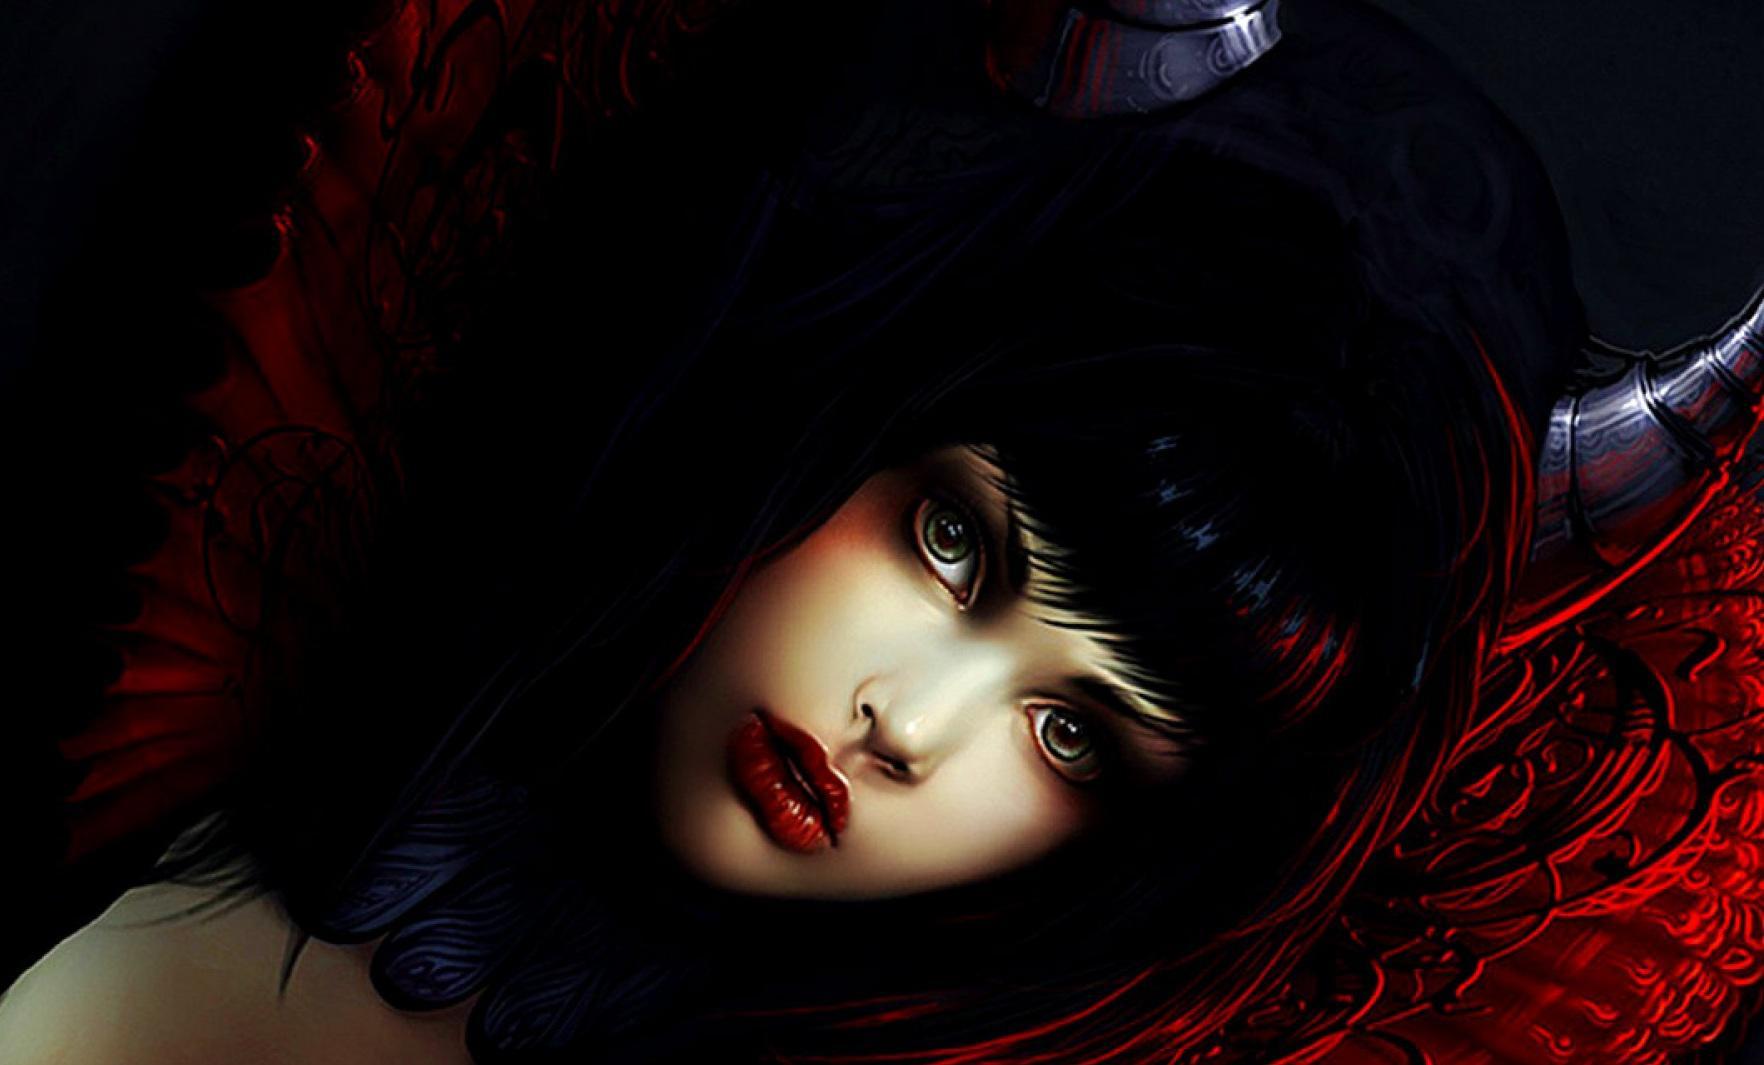 DEVIL GIRL WALLPAPER   123504   HD Wallpapers   [wallpapersinhqpw] 1764x1065